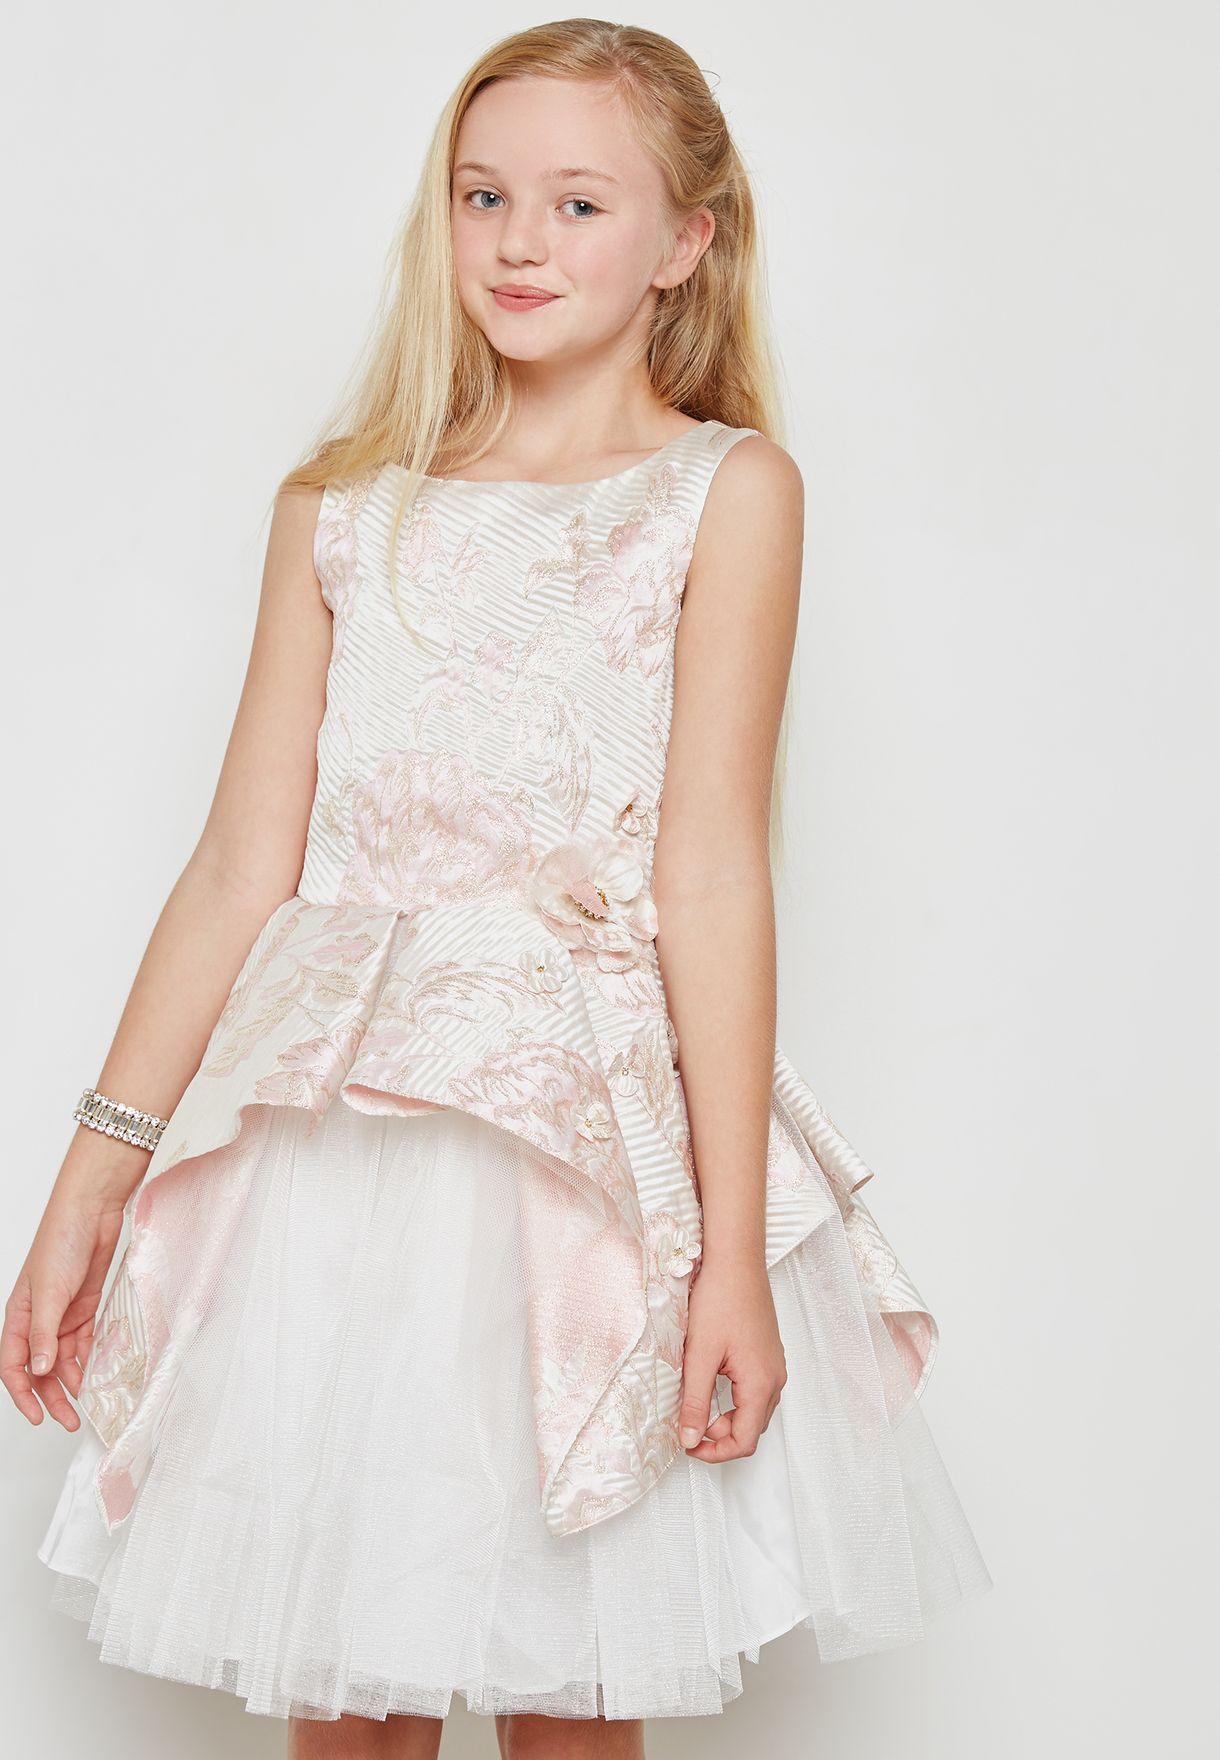 c2bce476a02 Shop David Charles pink Princess Dress 9136LX for Kids in UAE ...